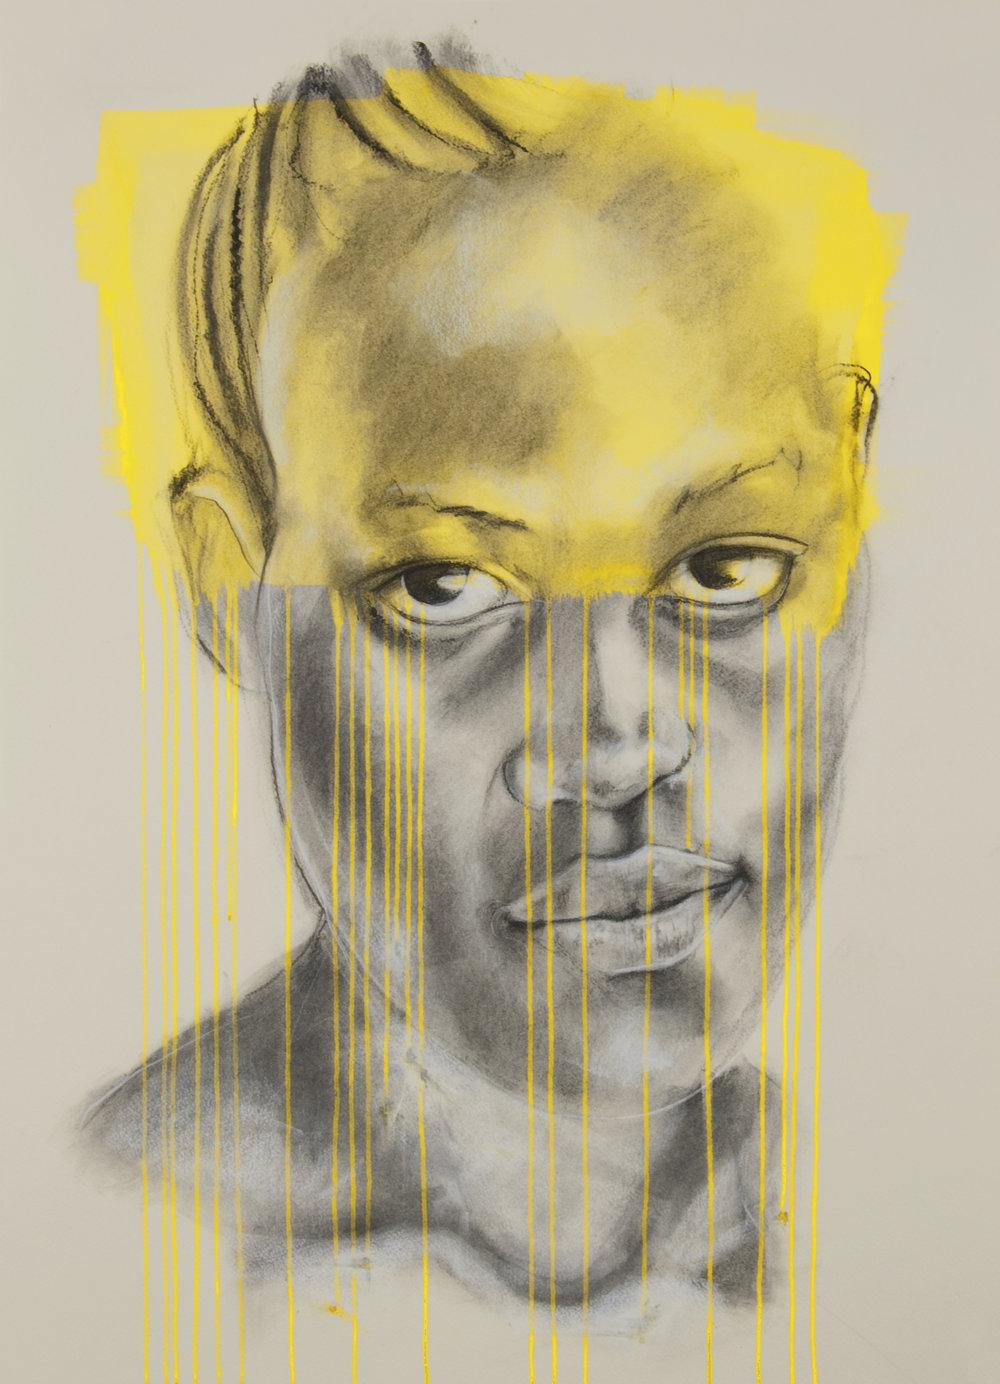 'Yellow', charcoal and ink, Jac Saorsa 2015